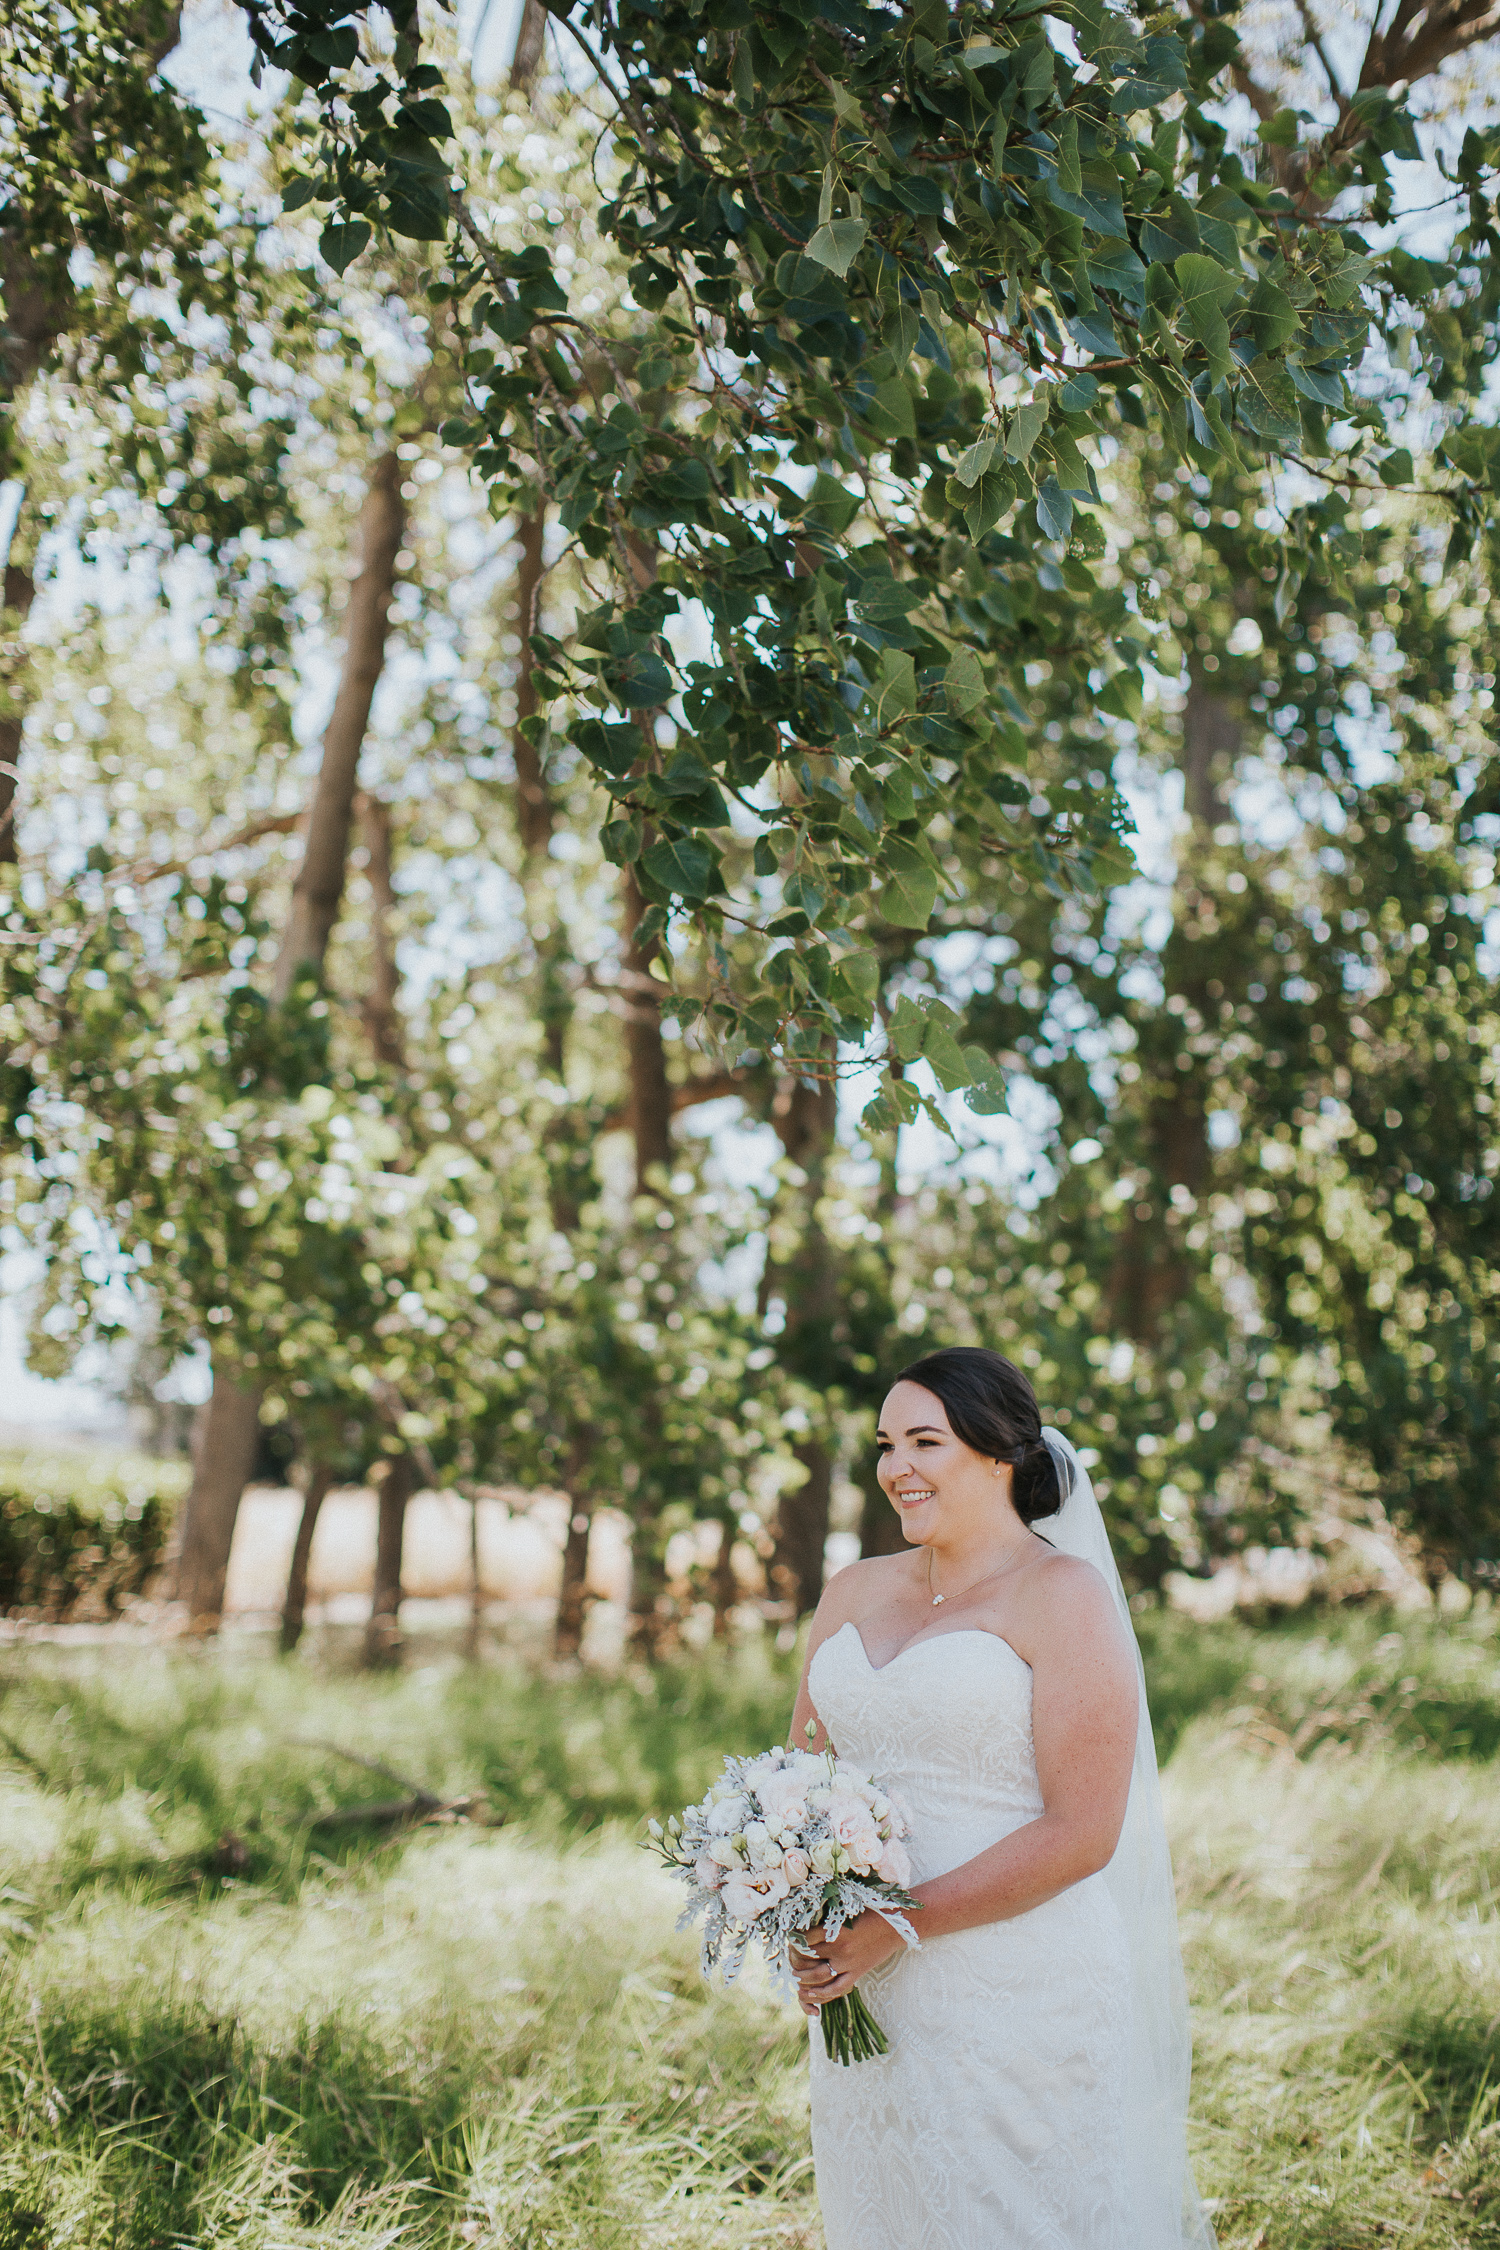 nicola gareth abbeville wedding photographer-71.jpg